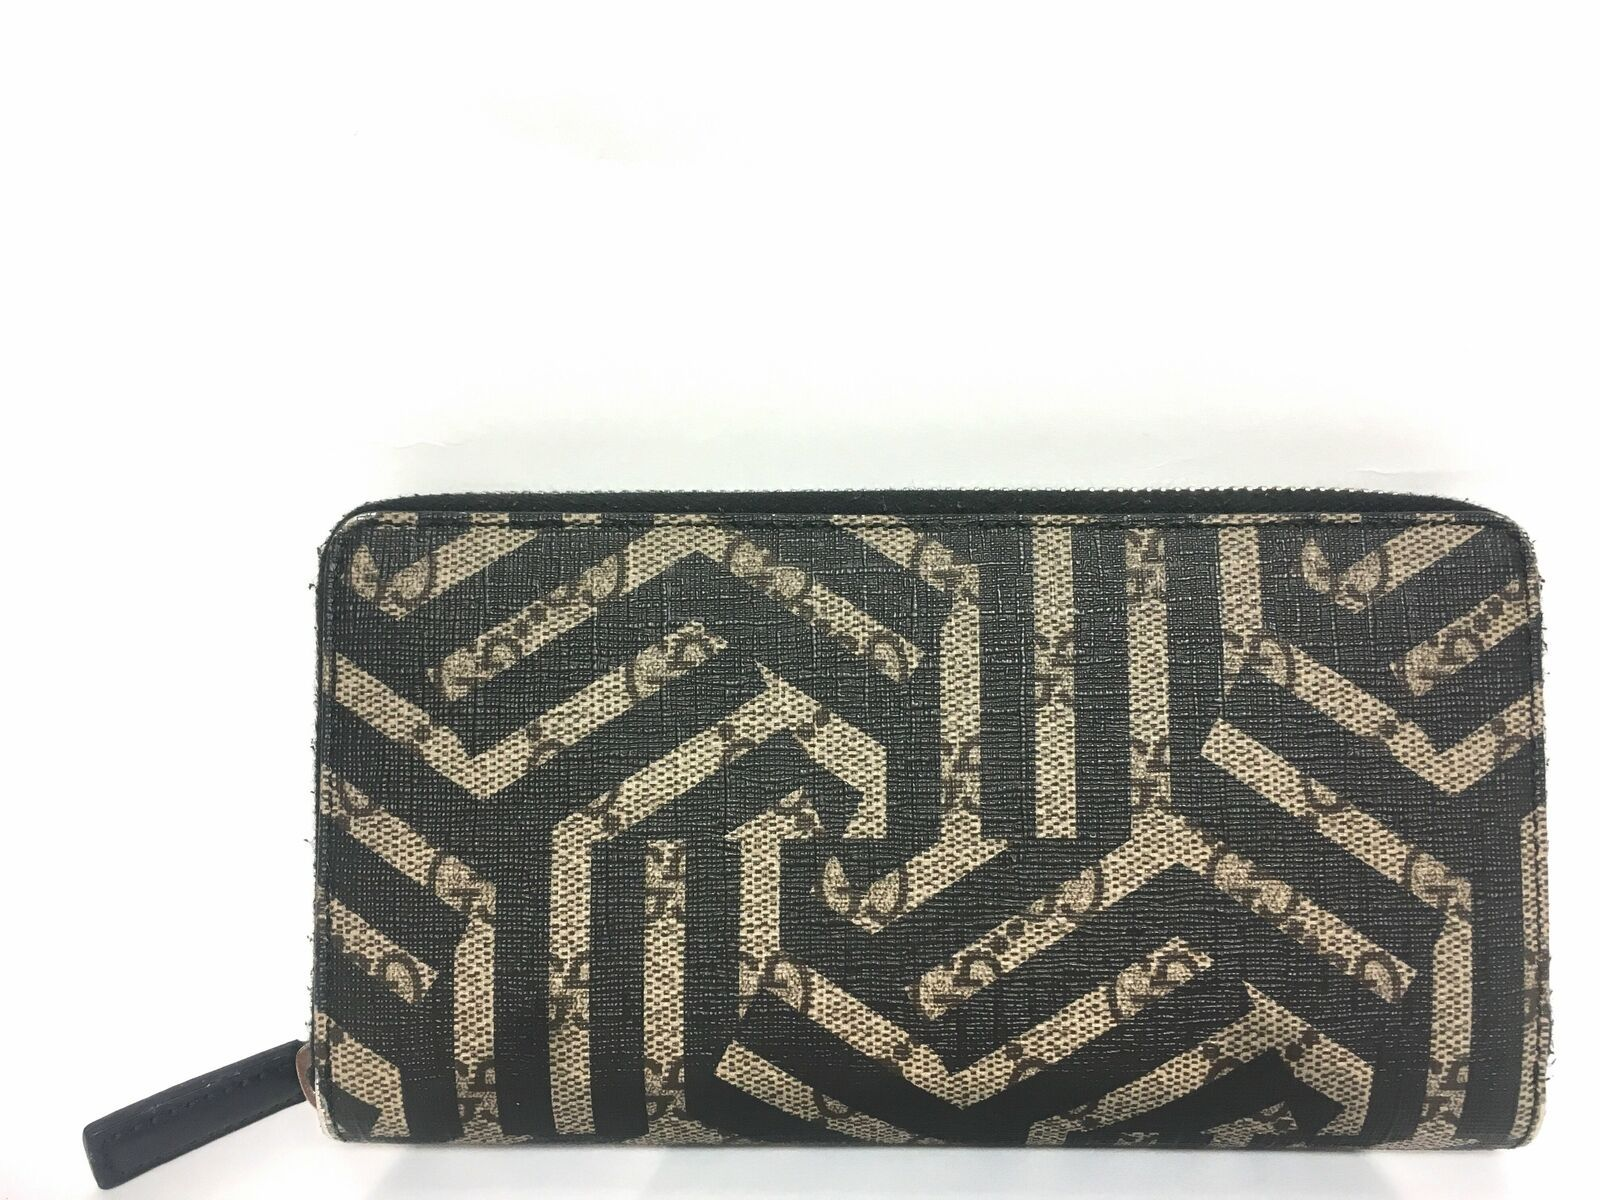 49c7190f6 Gucci Canvas Printed Zip Around Wallet - $285.86